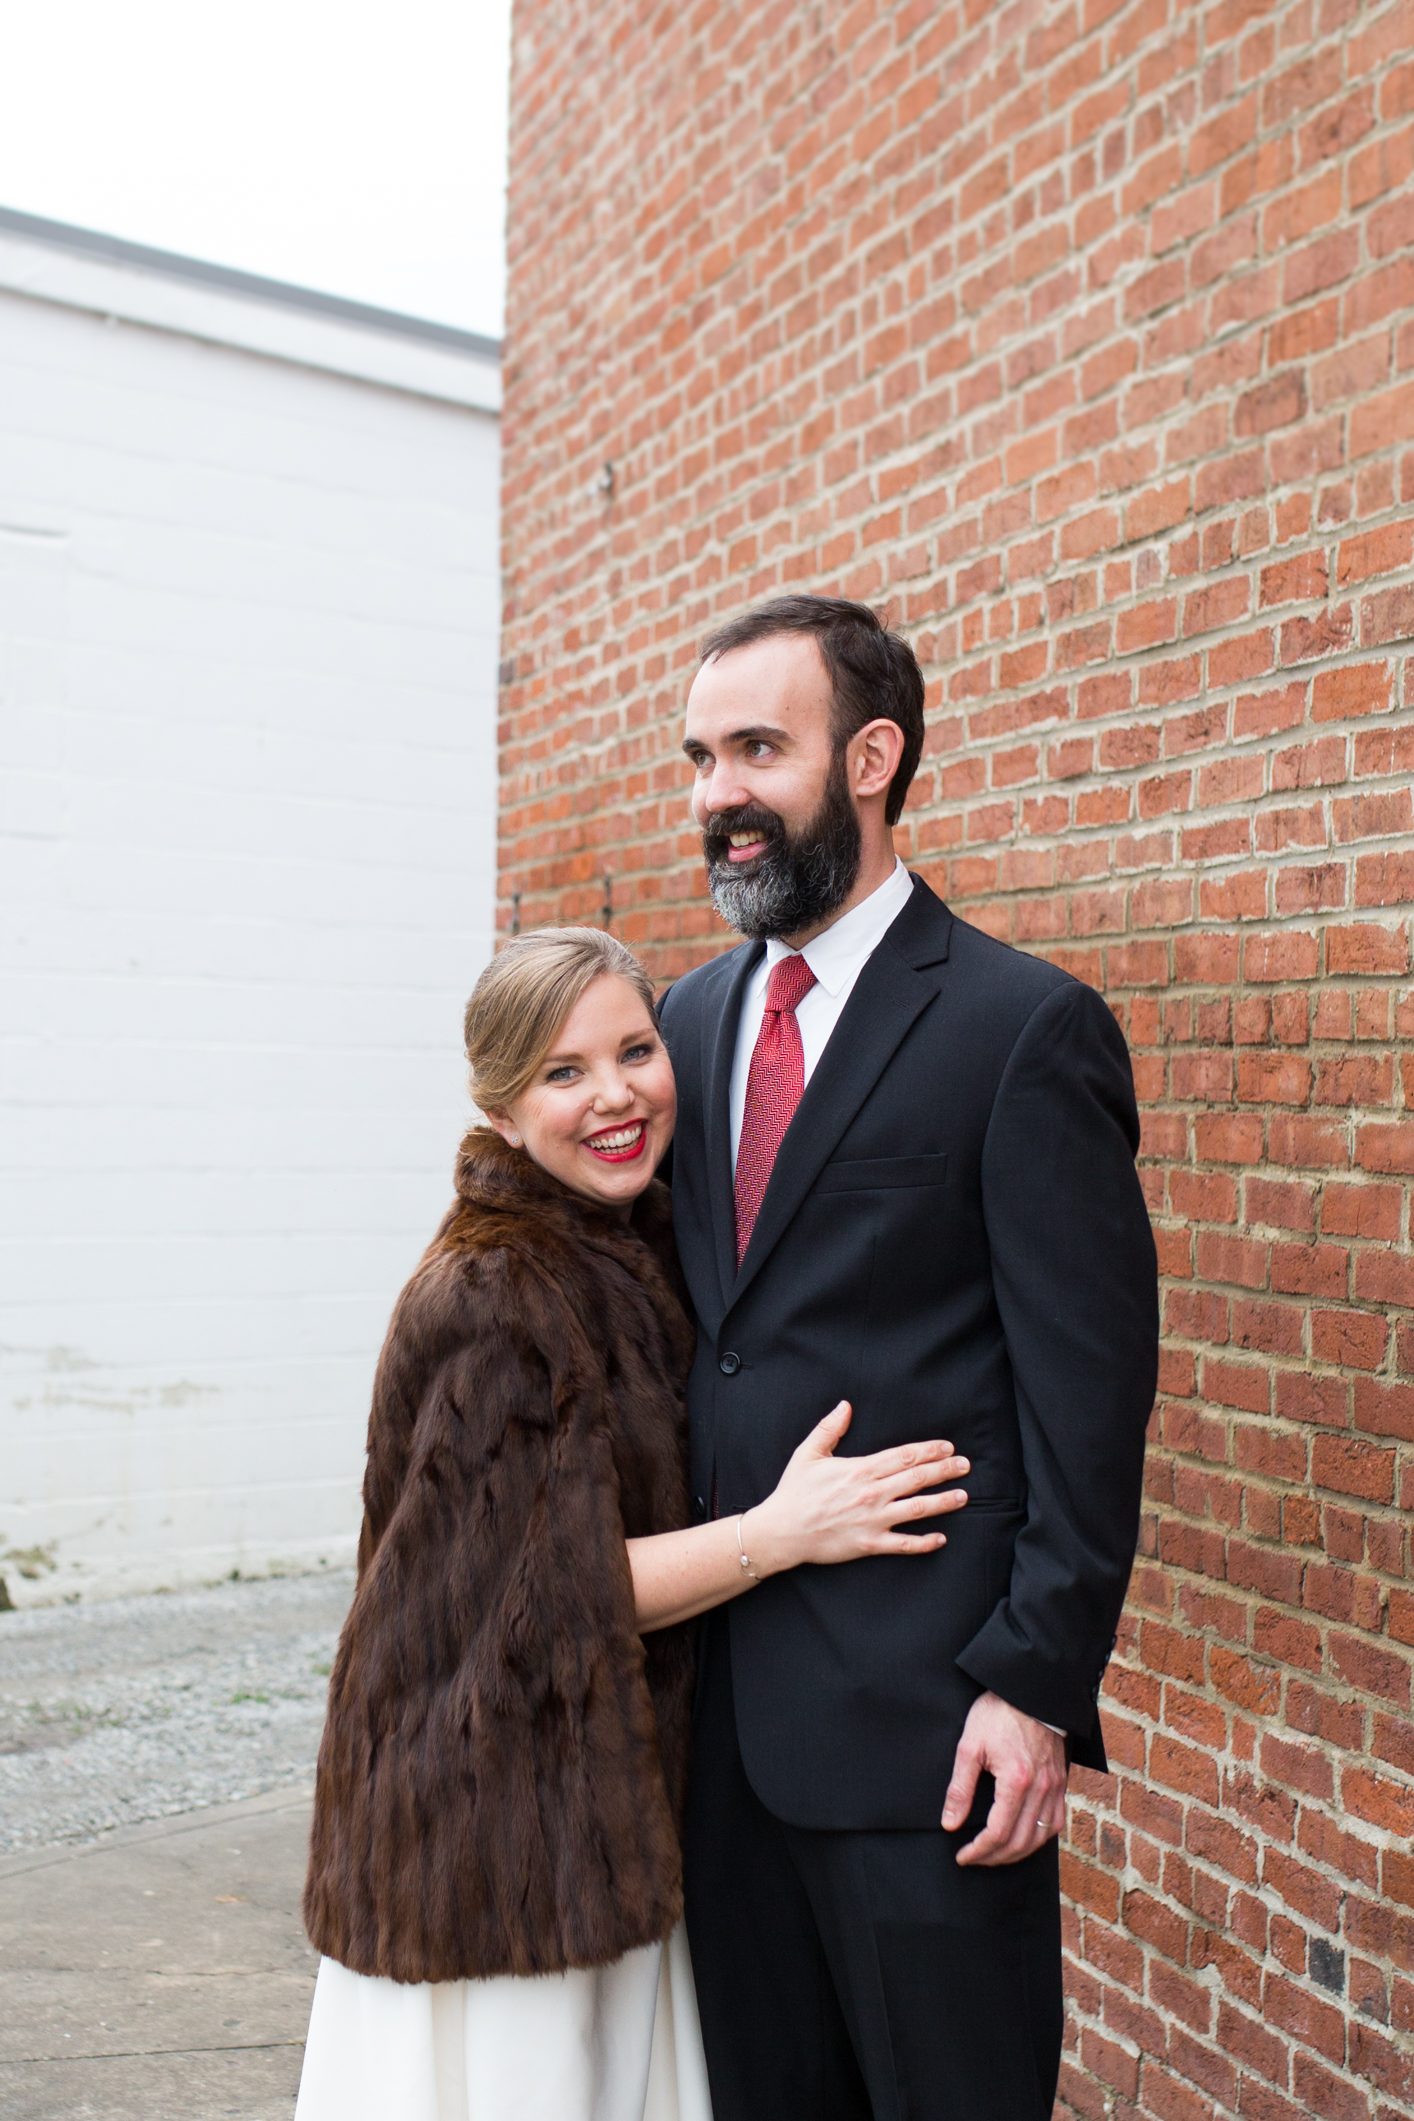 Megan & Josh Wedding Website 2016 (24 of 141).jpg